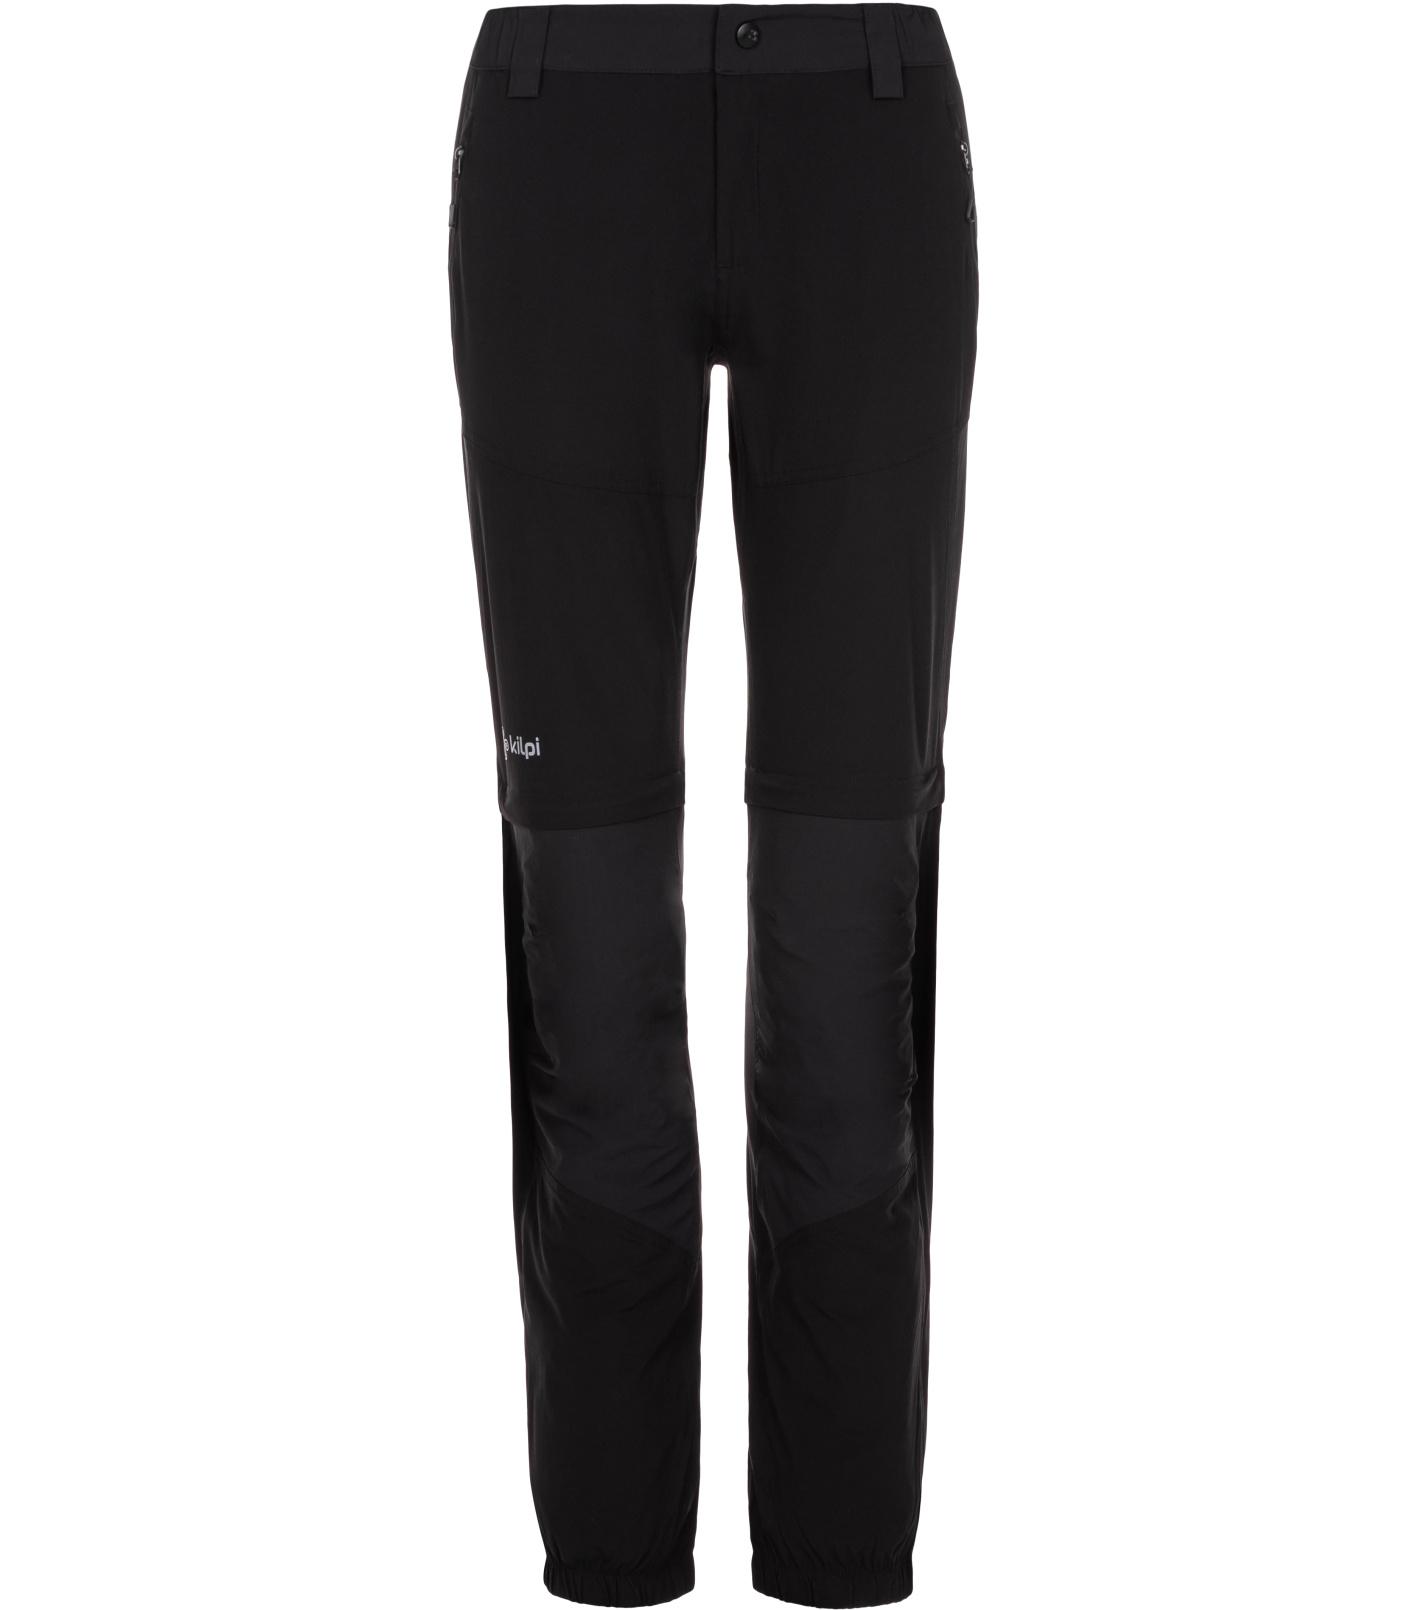 KILPI Dámské outdoorové kalhoty HOSIO-W ML0022KIBLK Černá 38